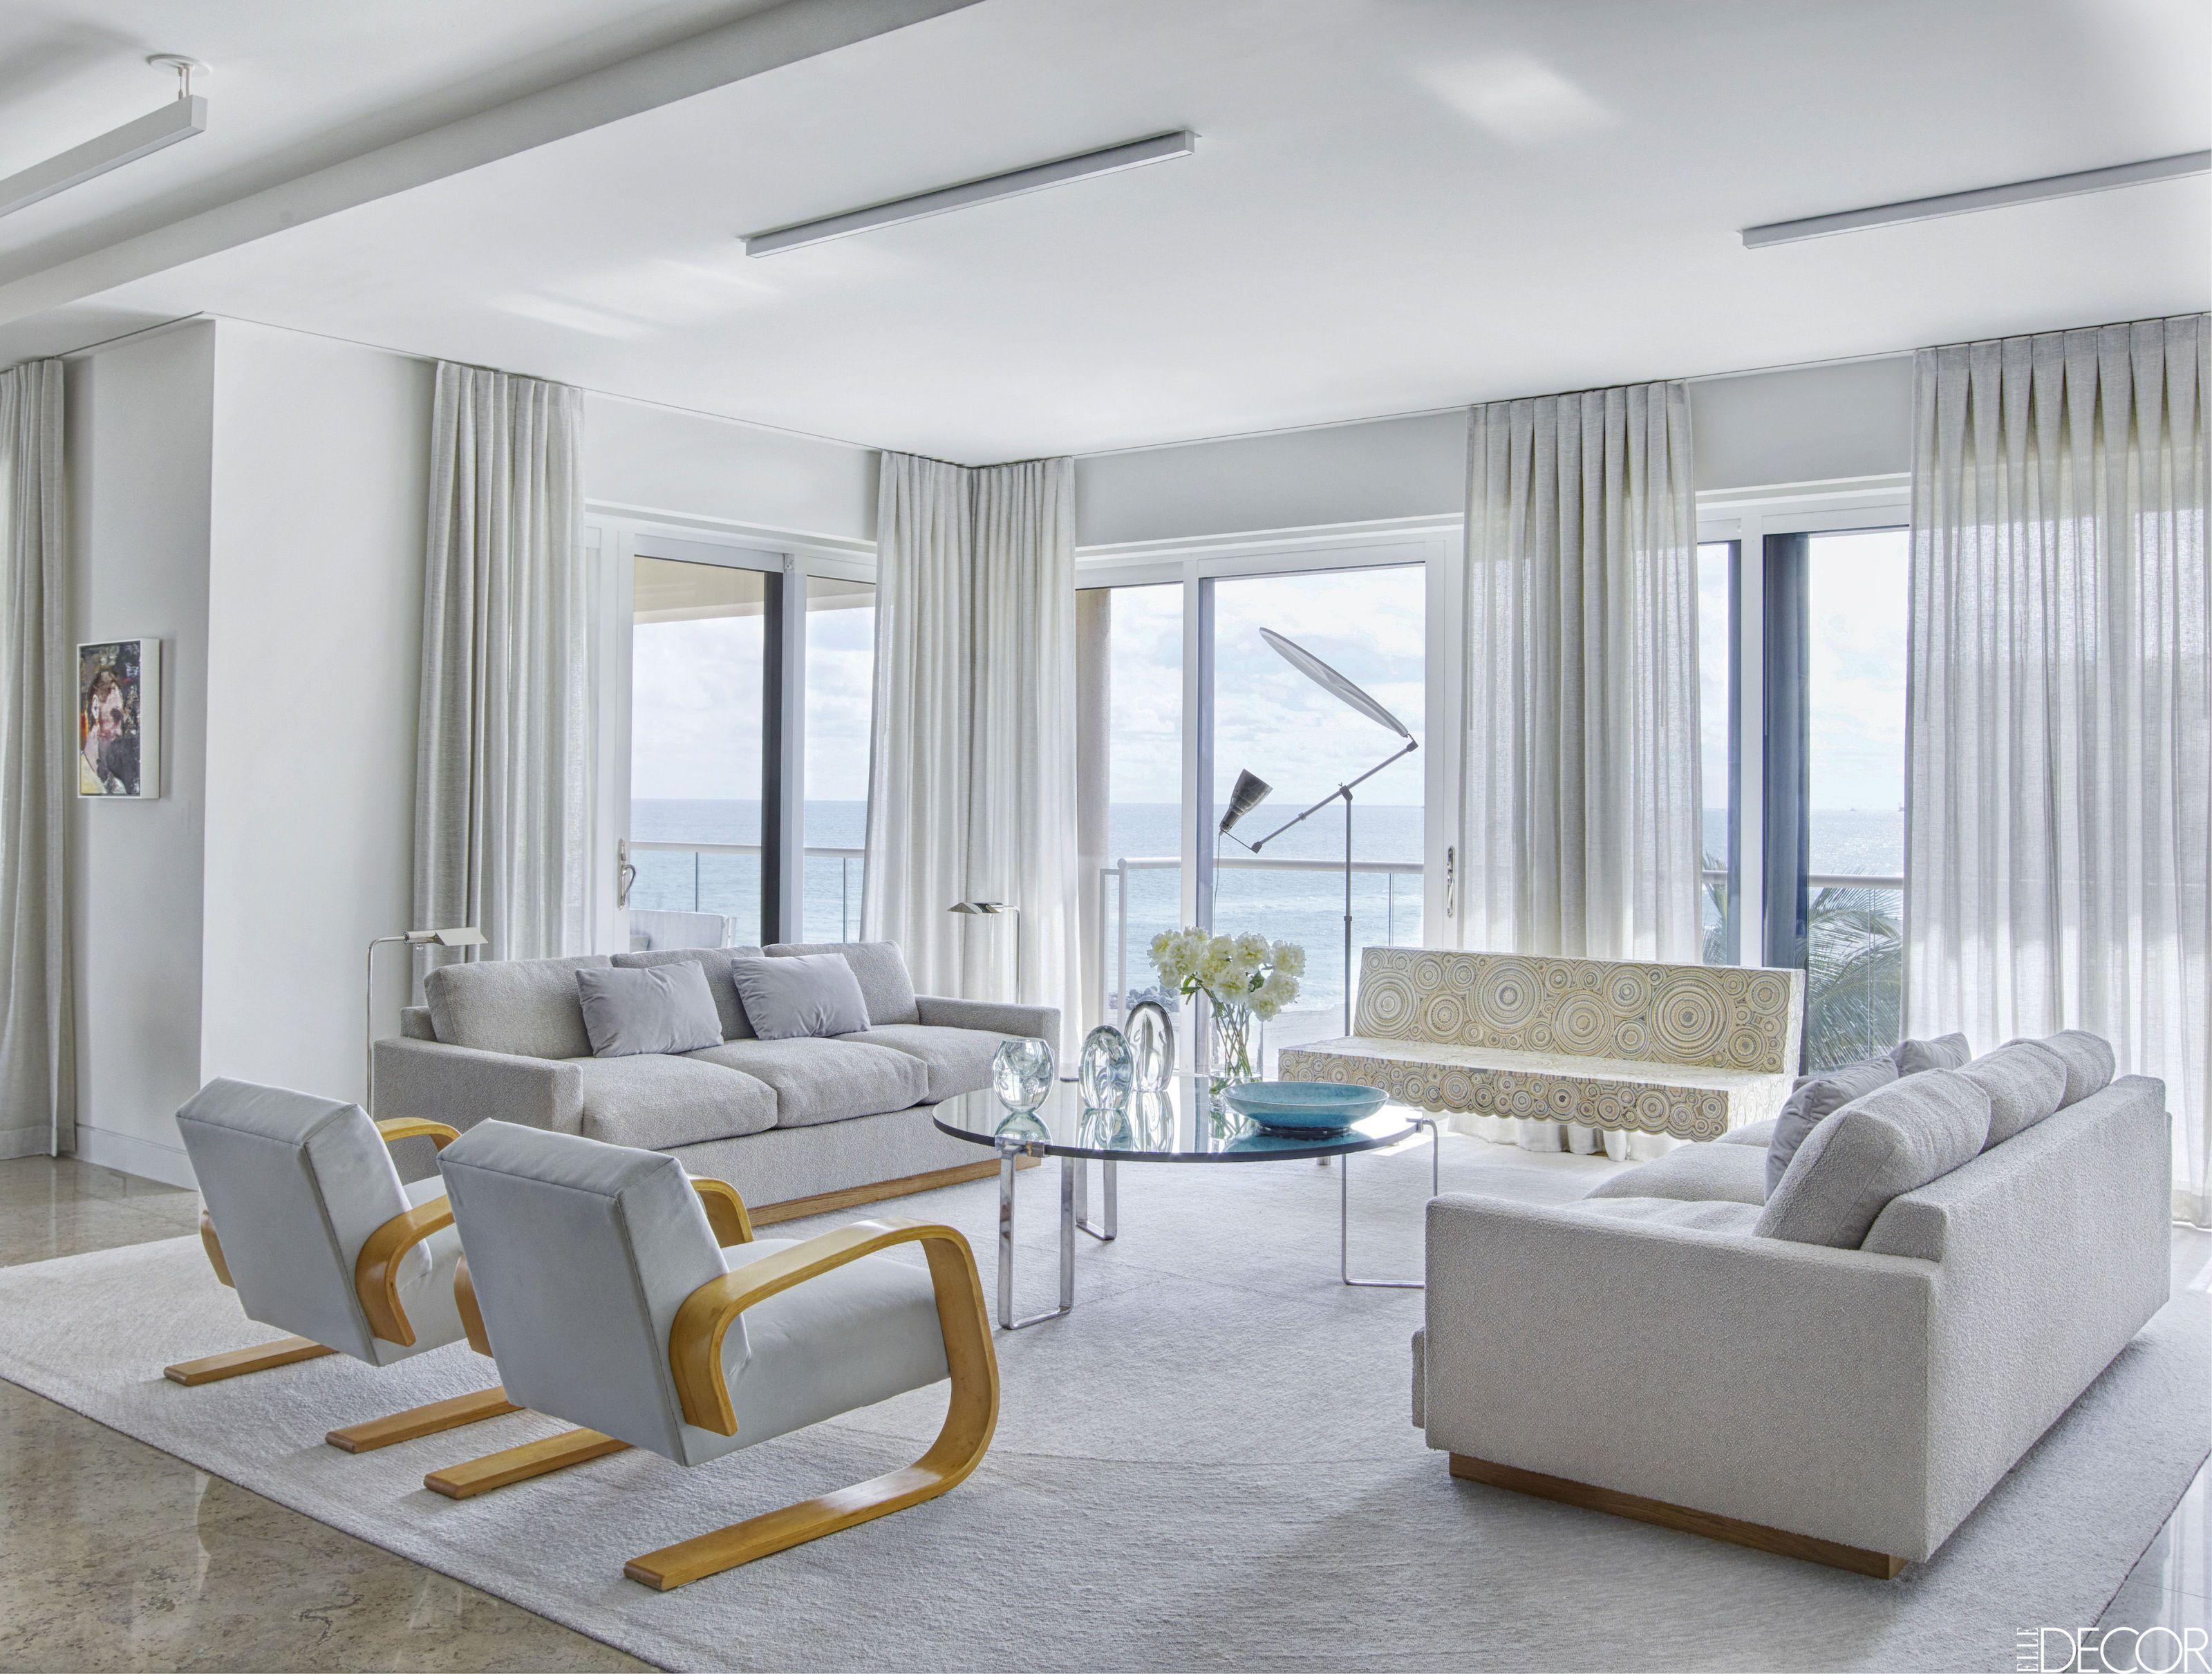 20 Best Living Room IdeasBeautiful Living Room Decor